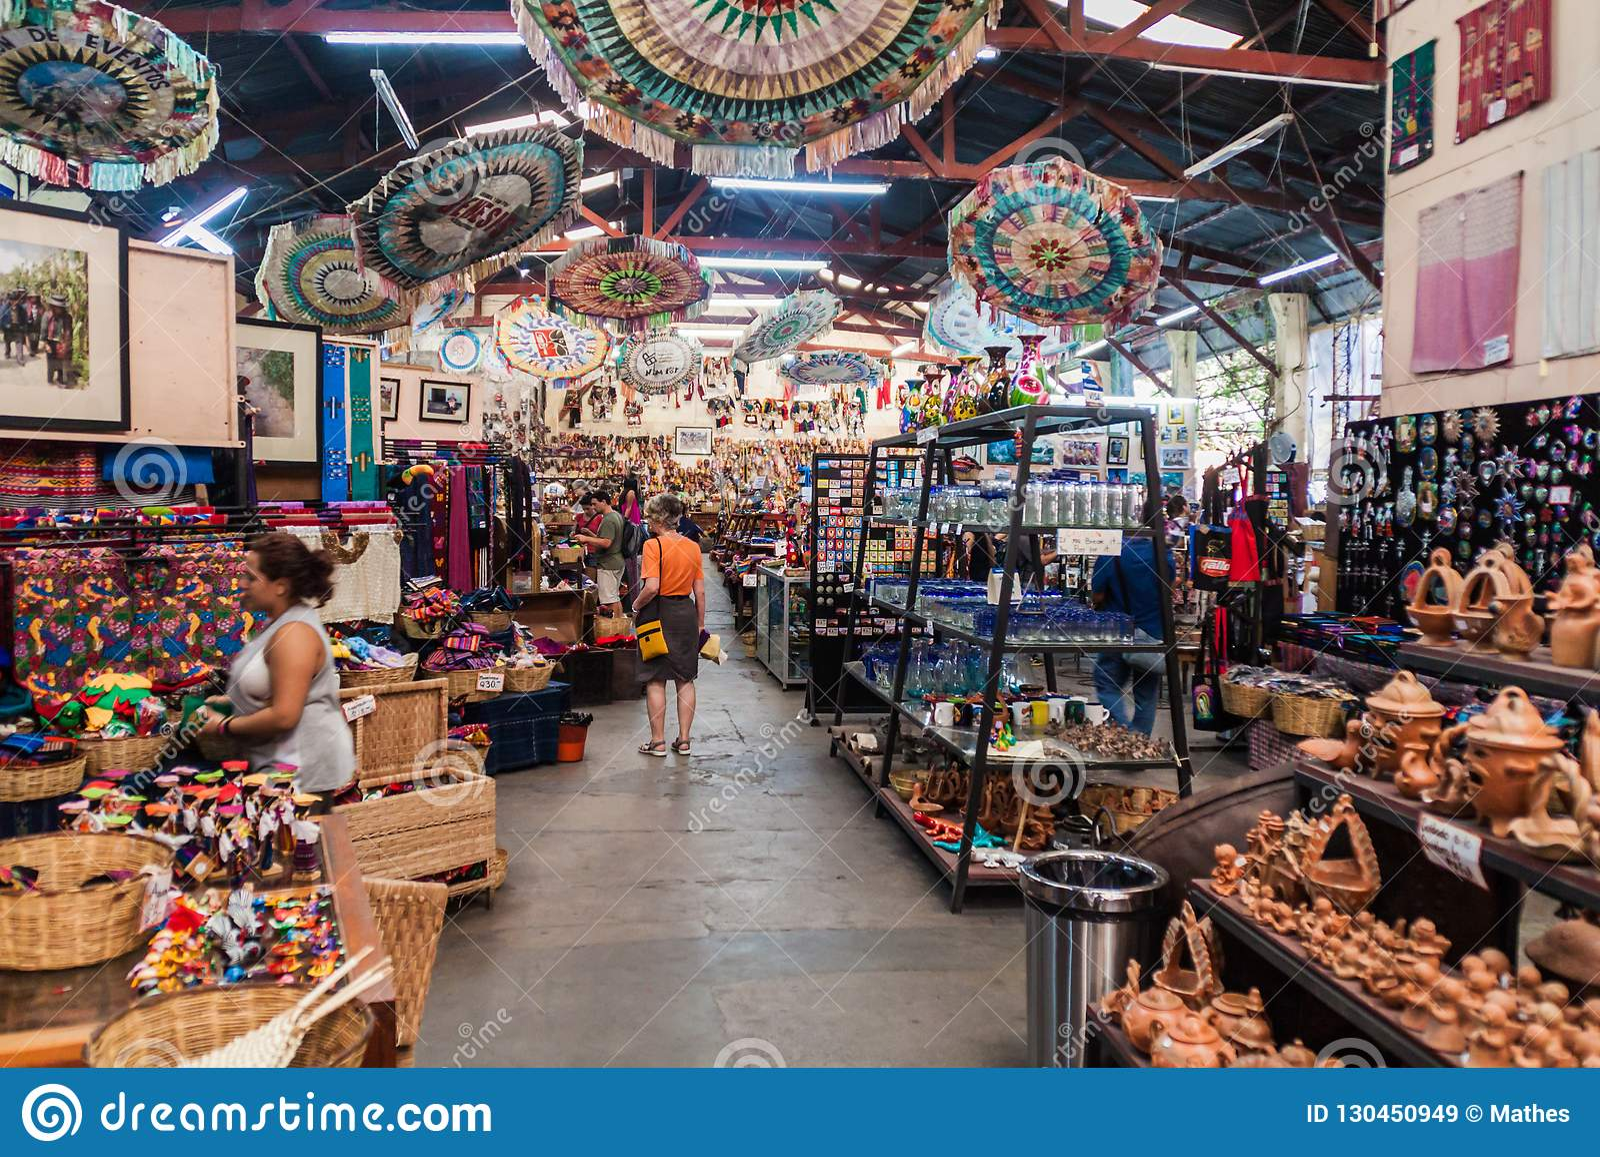 Antigua Guatemala March 26 2016 Interior Of Nim Pot Textiles